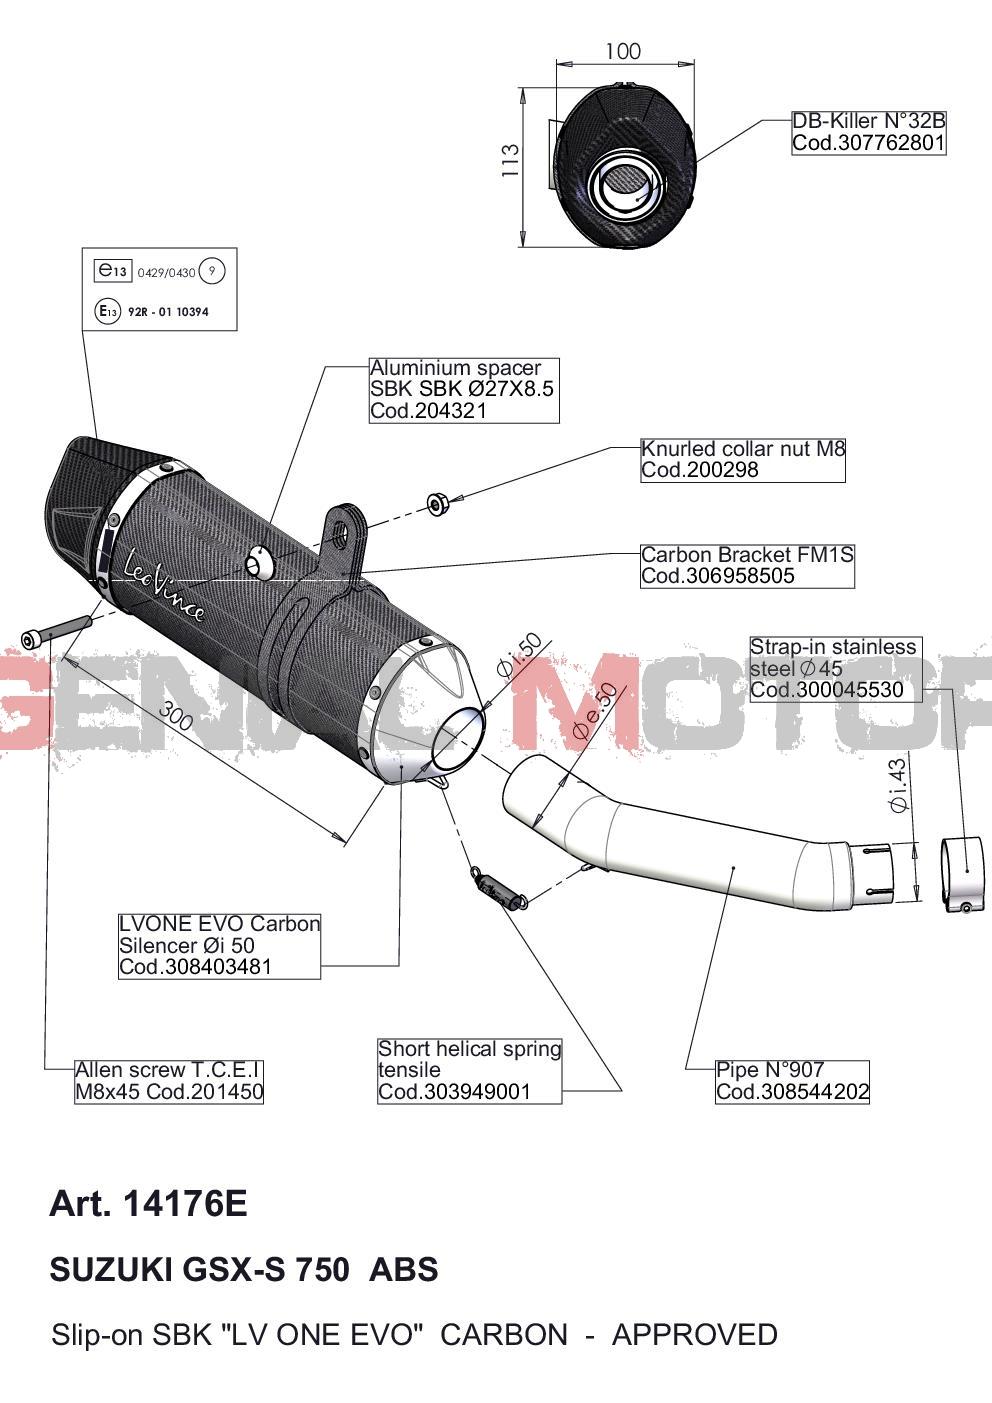 14176E Pot D'Echappement Lv One Evo Carbone Suzuki Gsx S 750/Z Abs 2017 > 2020